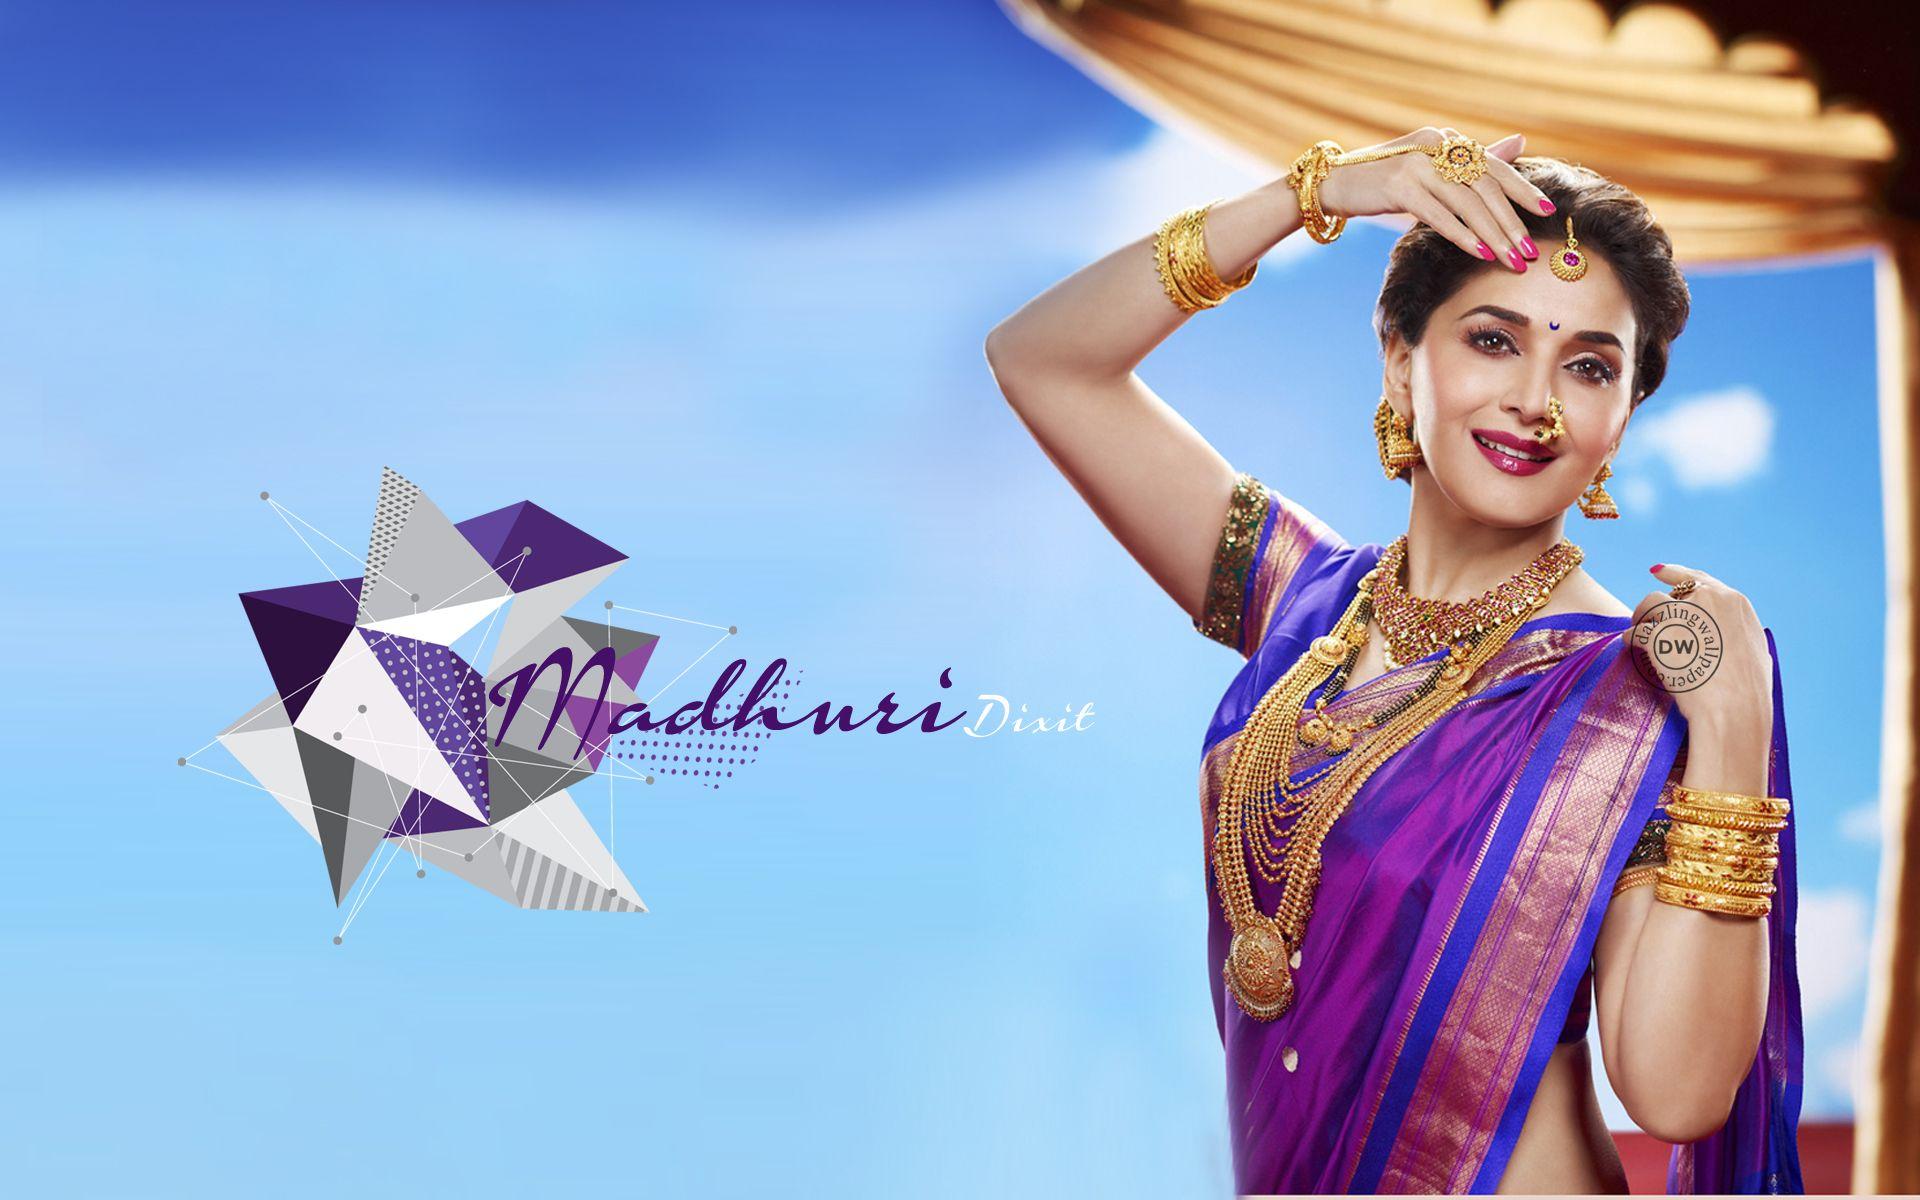 Wallpaper download madhuri dixit - Madhuri Dixit Hd Wallpaper Madhuri Dixit Bollywood Actress Indian Film Actress Beautiful